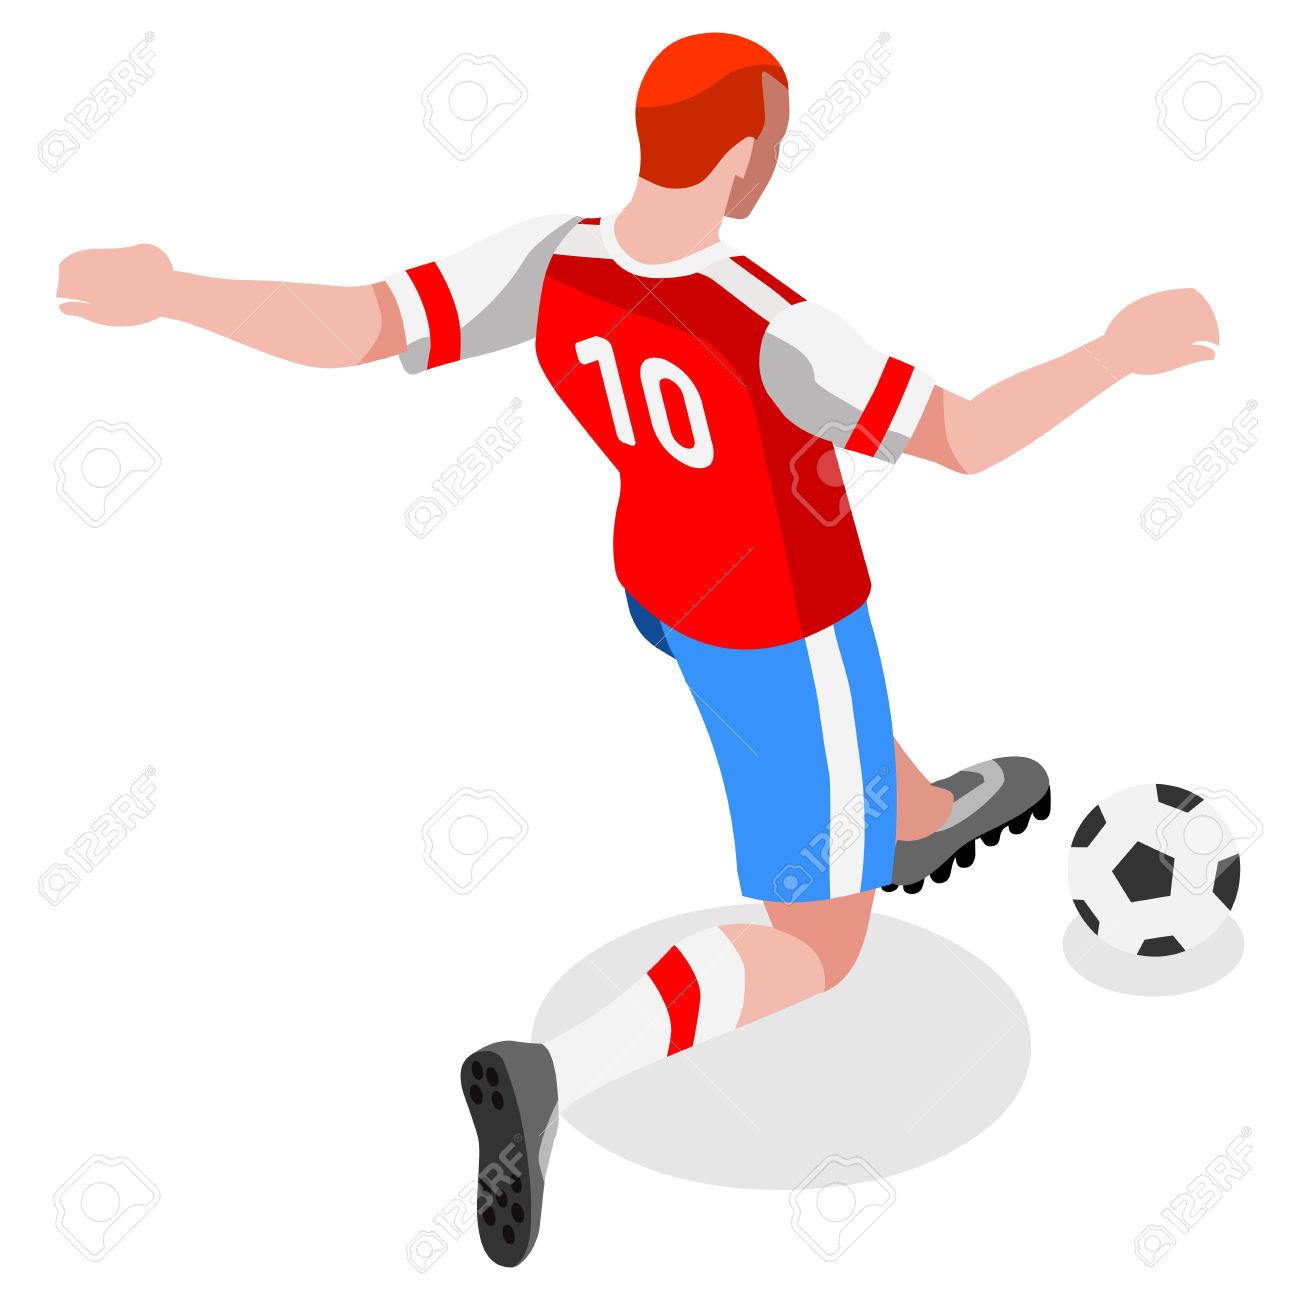 Soccer Striker Player Athlete Sports Icon Set.3D Isometric Field.